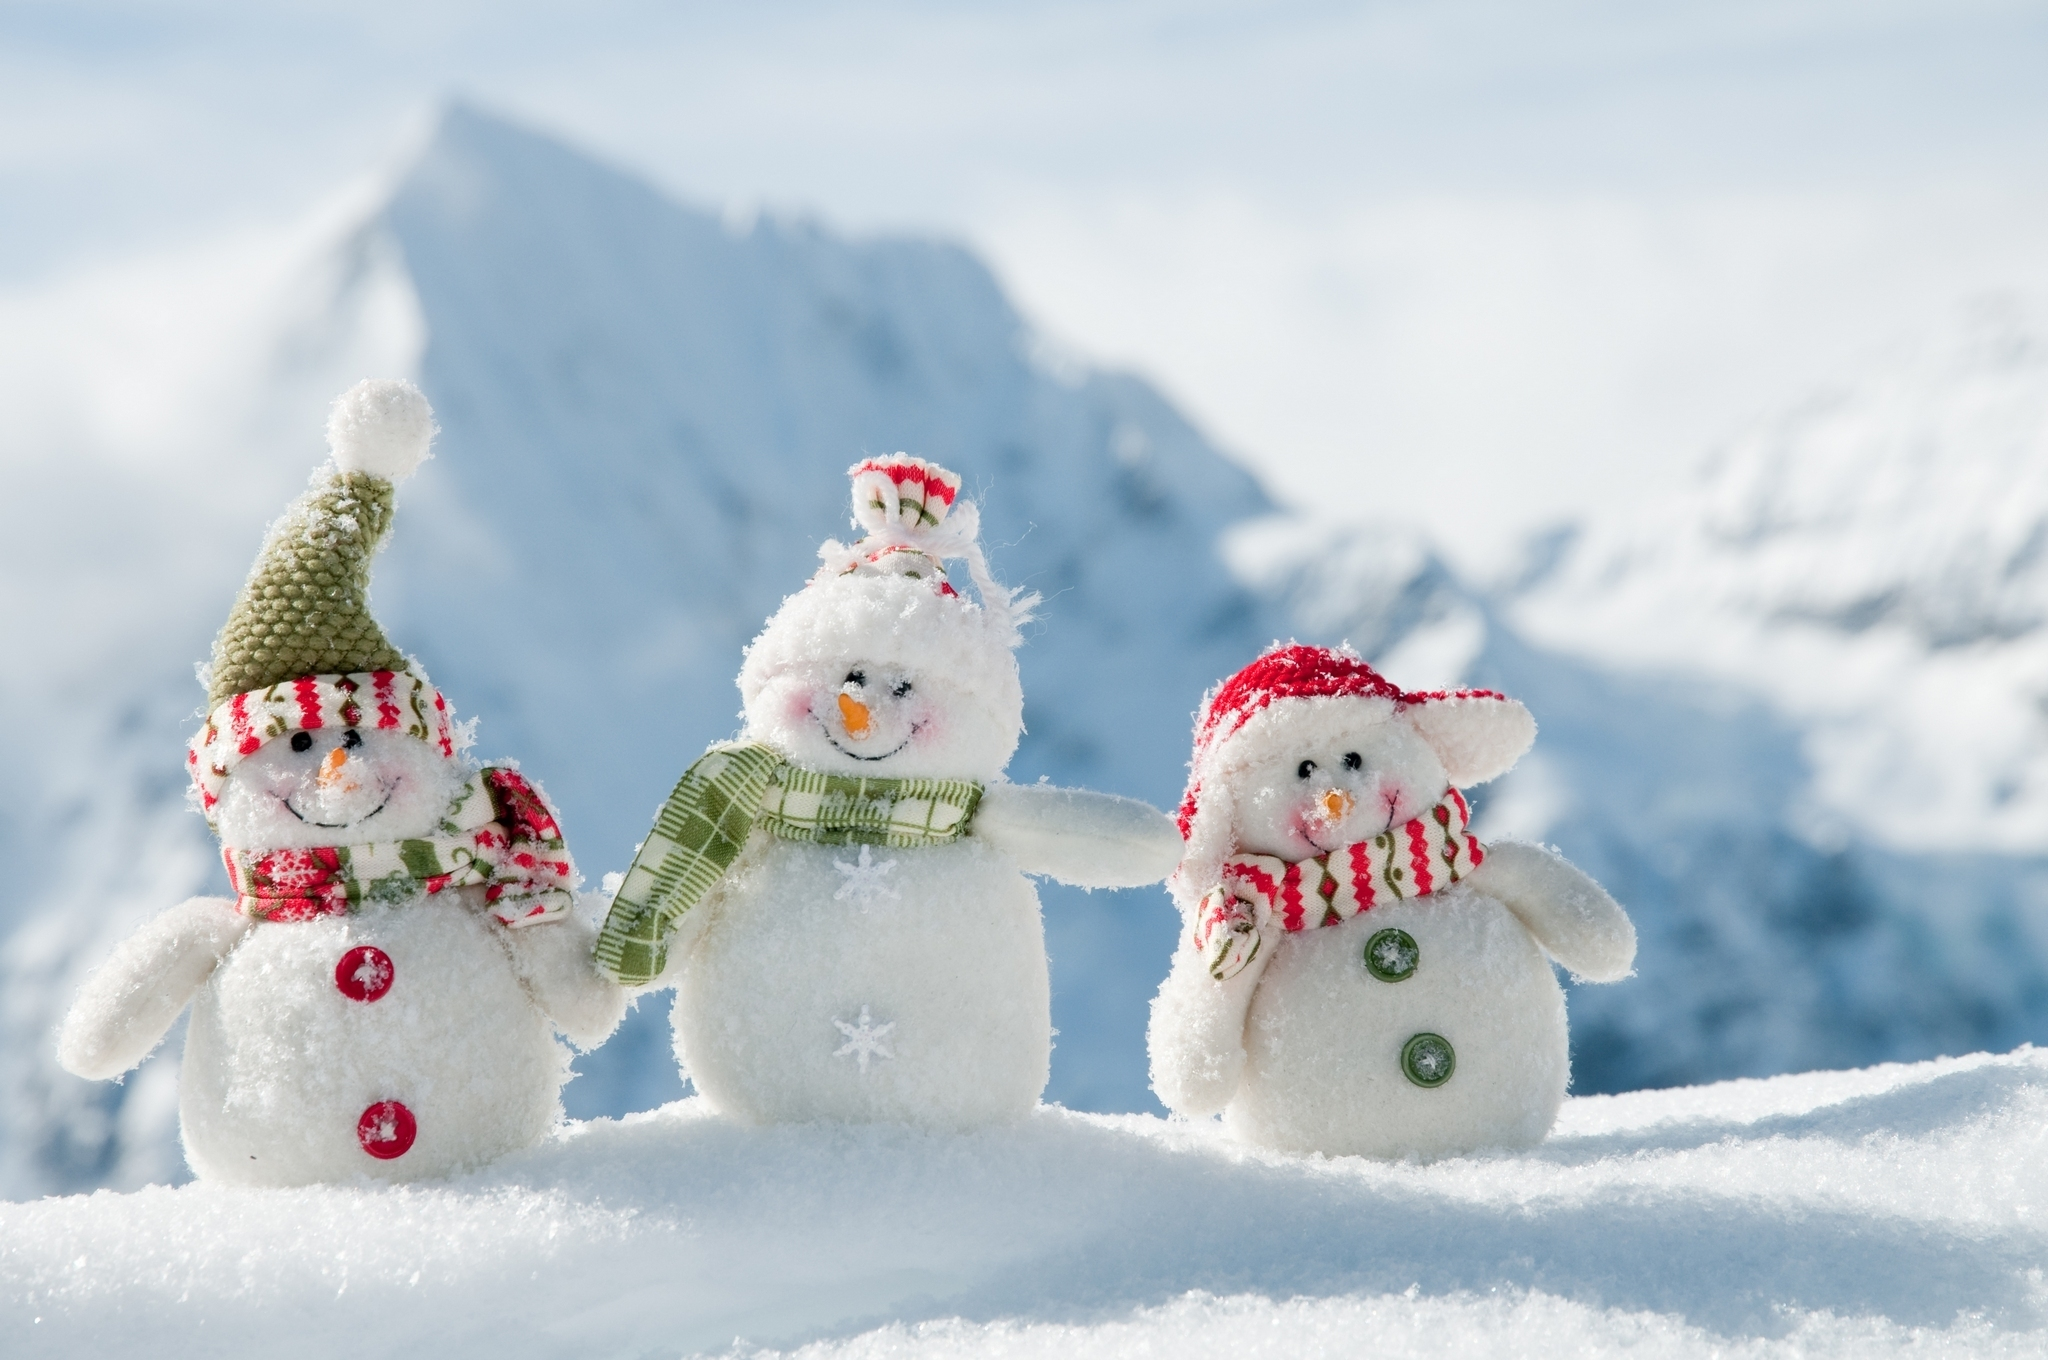 merry-christmas-wallpapers-snowman-A2.jpg